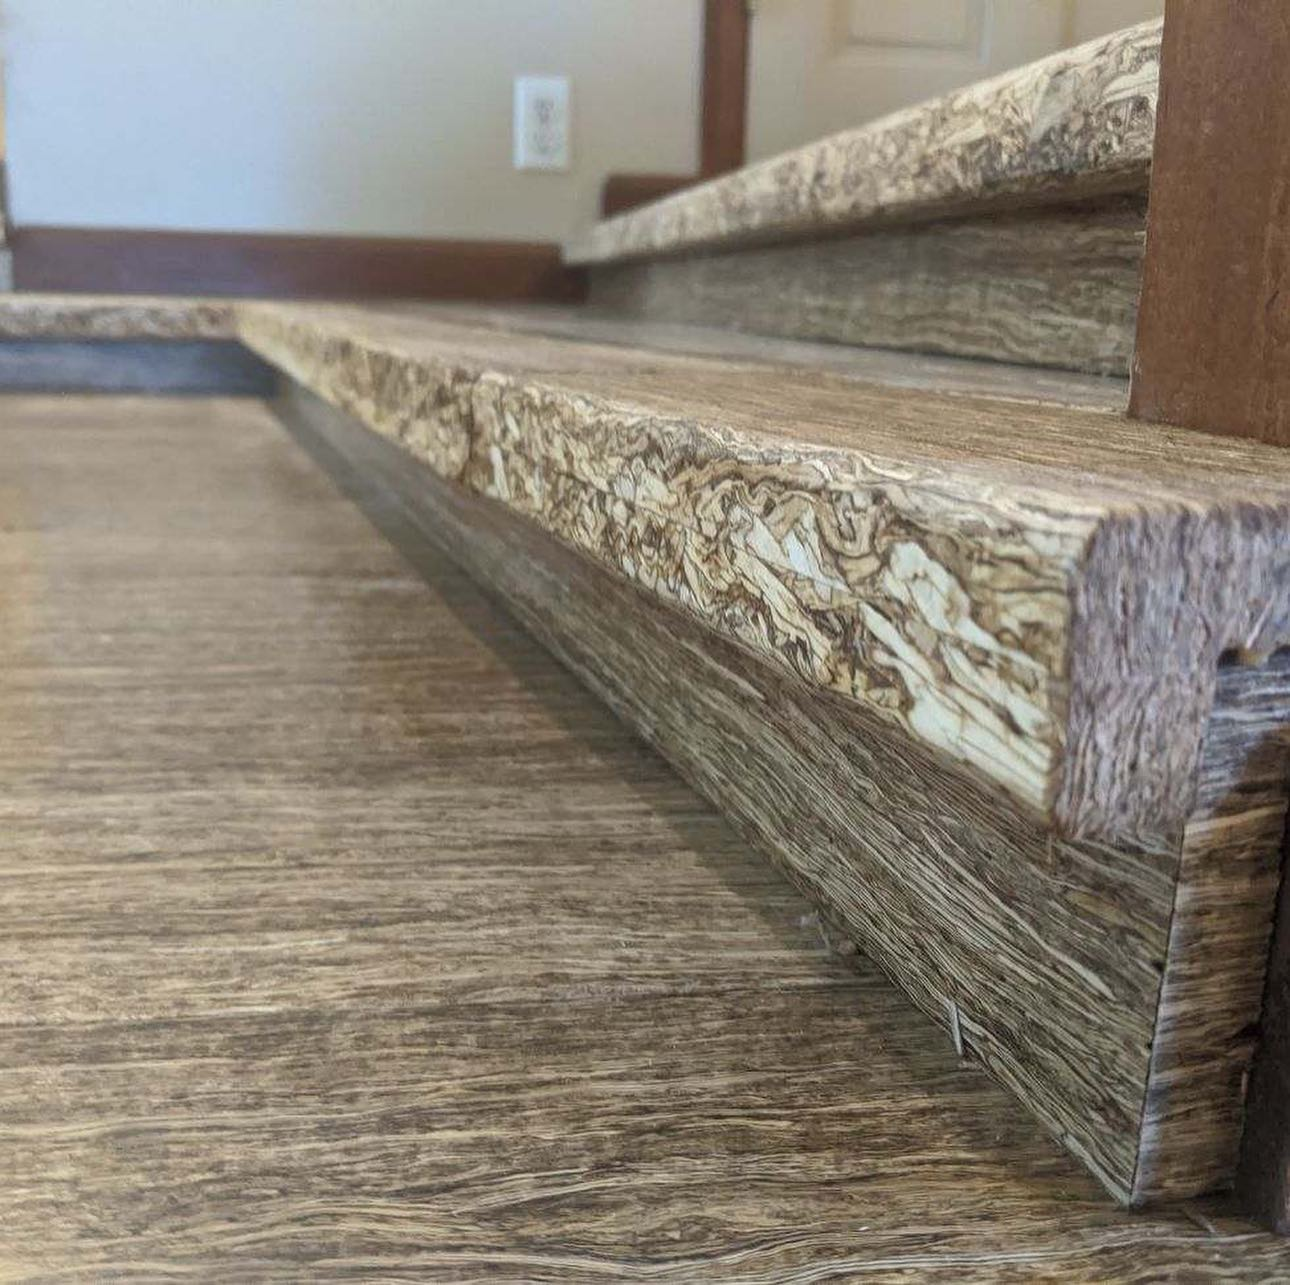 HempWood flooring and woodwork